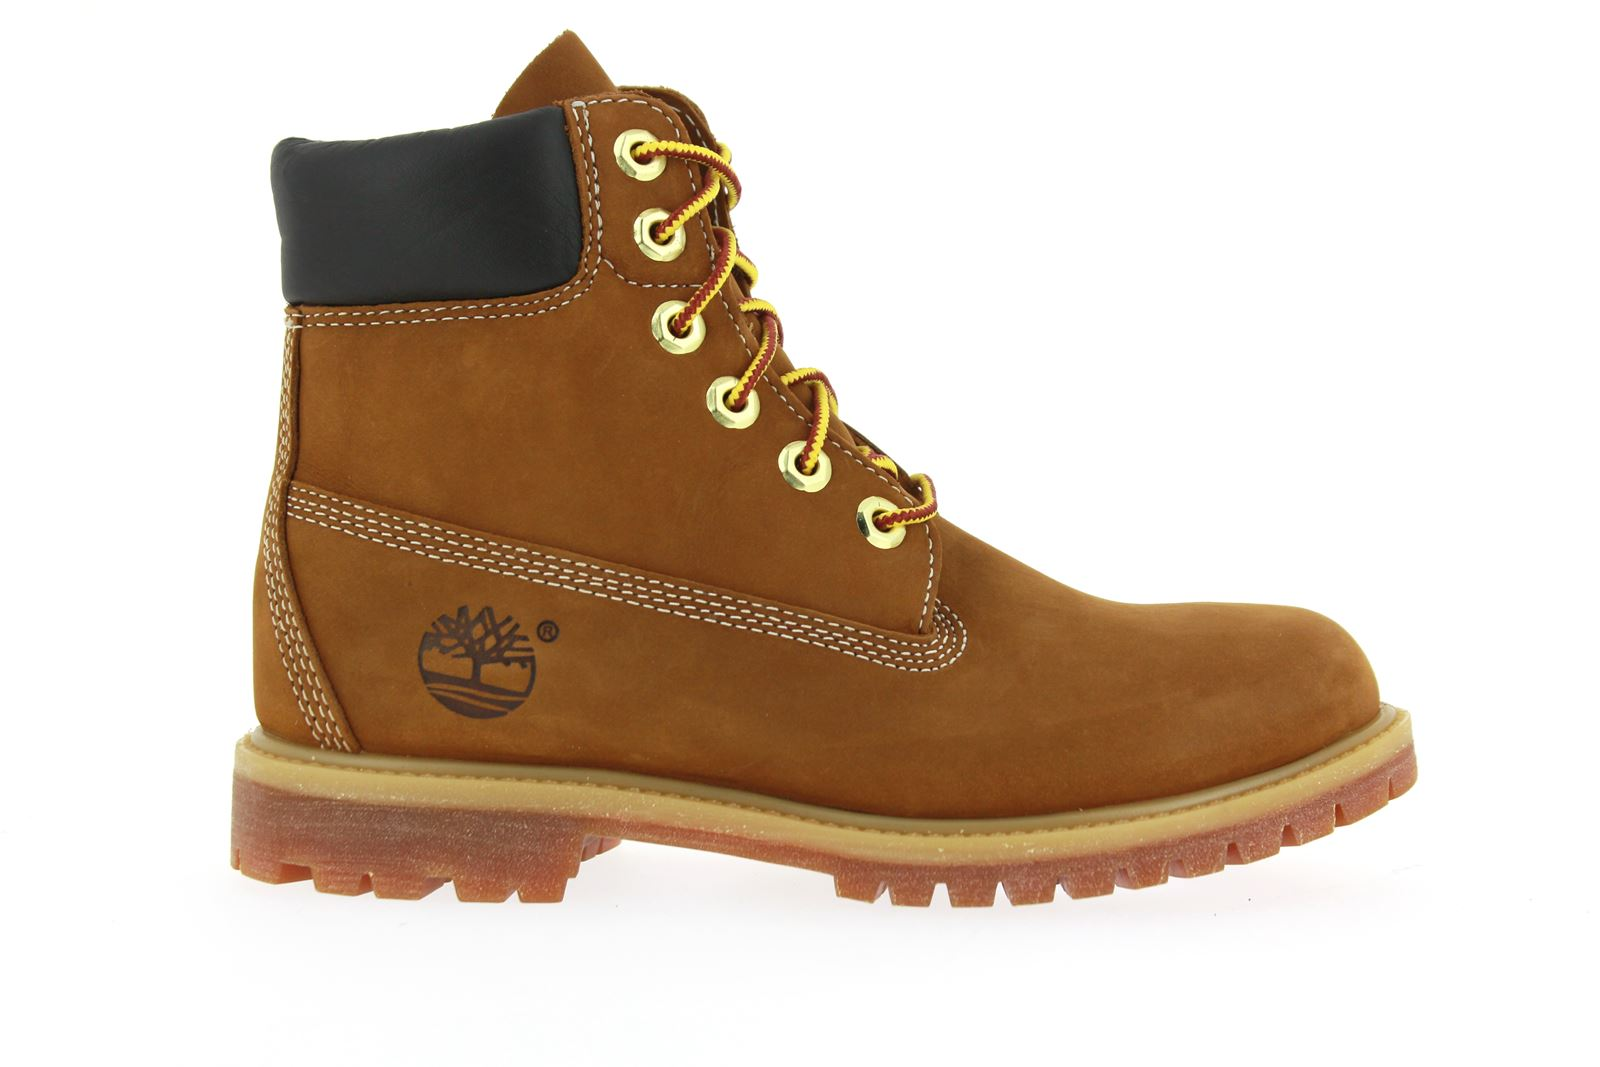 Timberland Boots  NUBUK BROWN